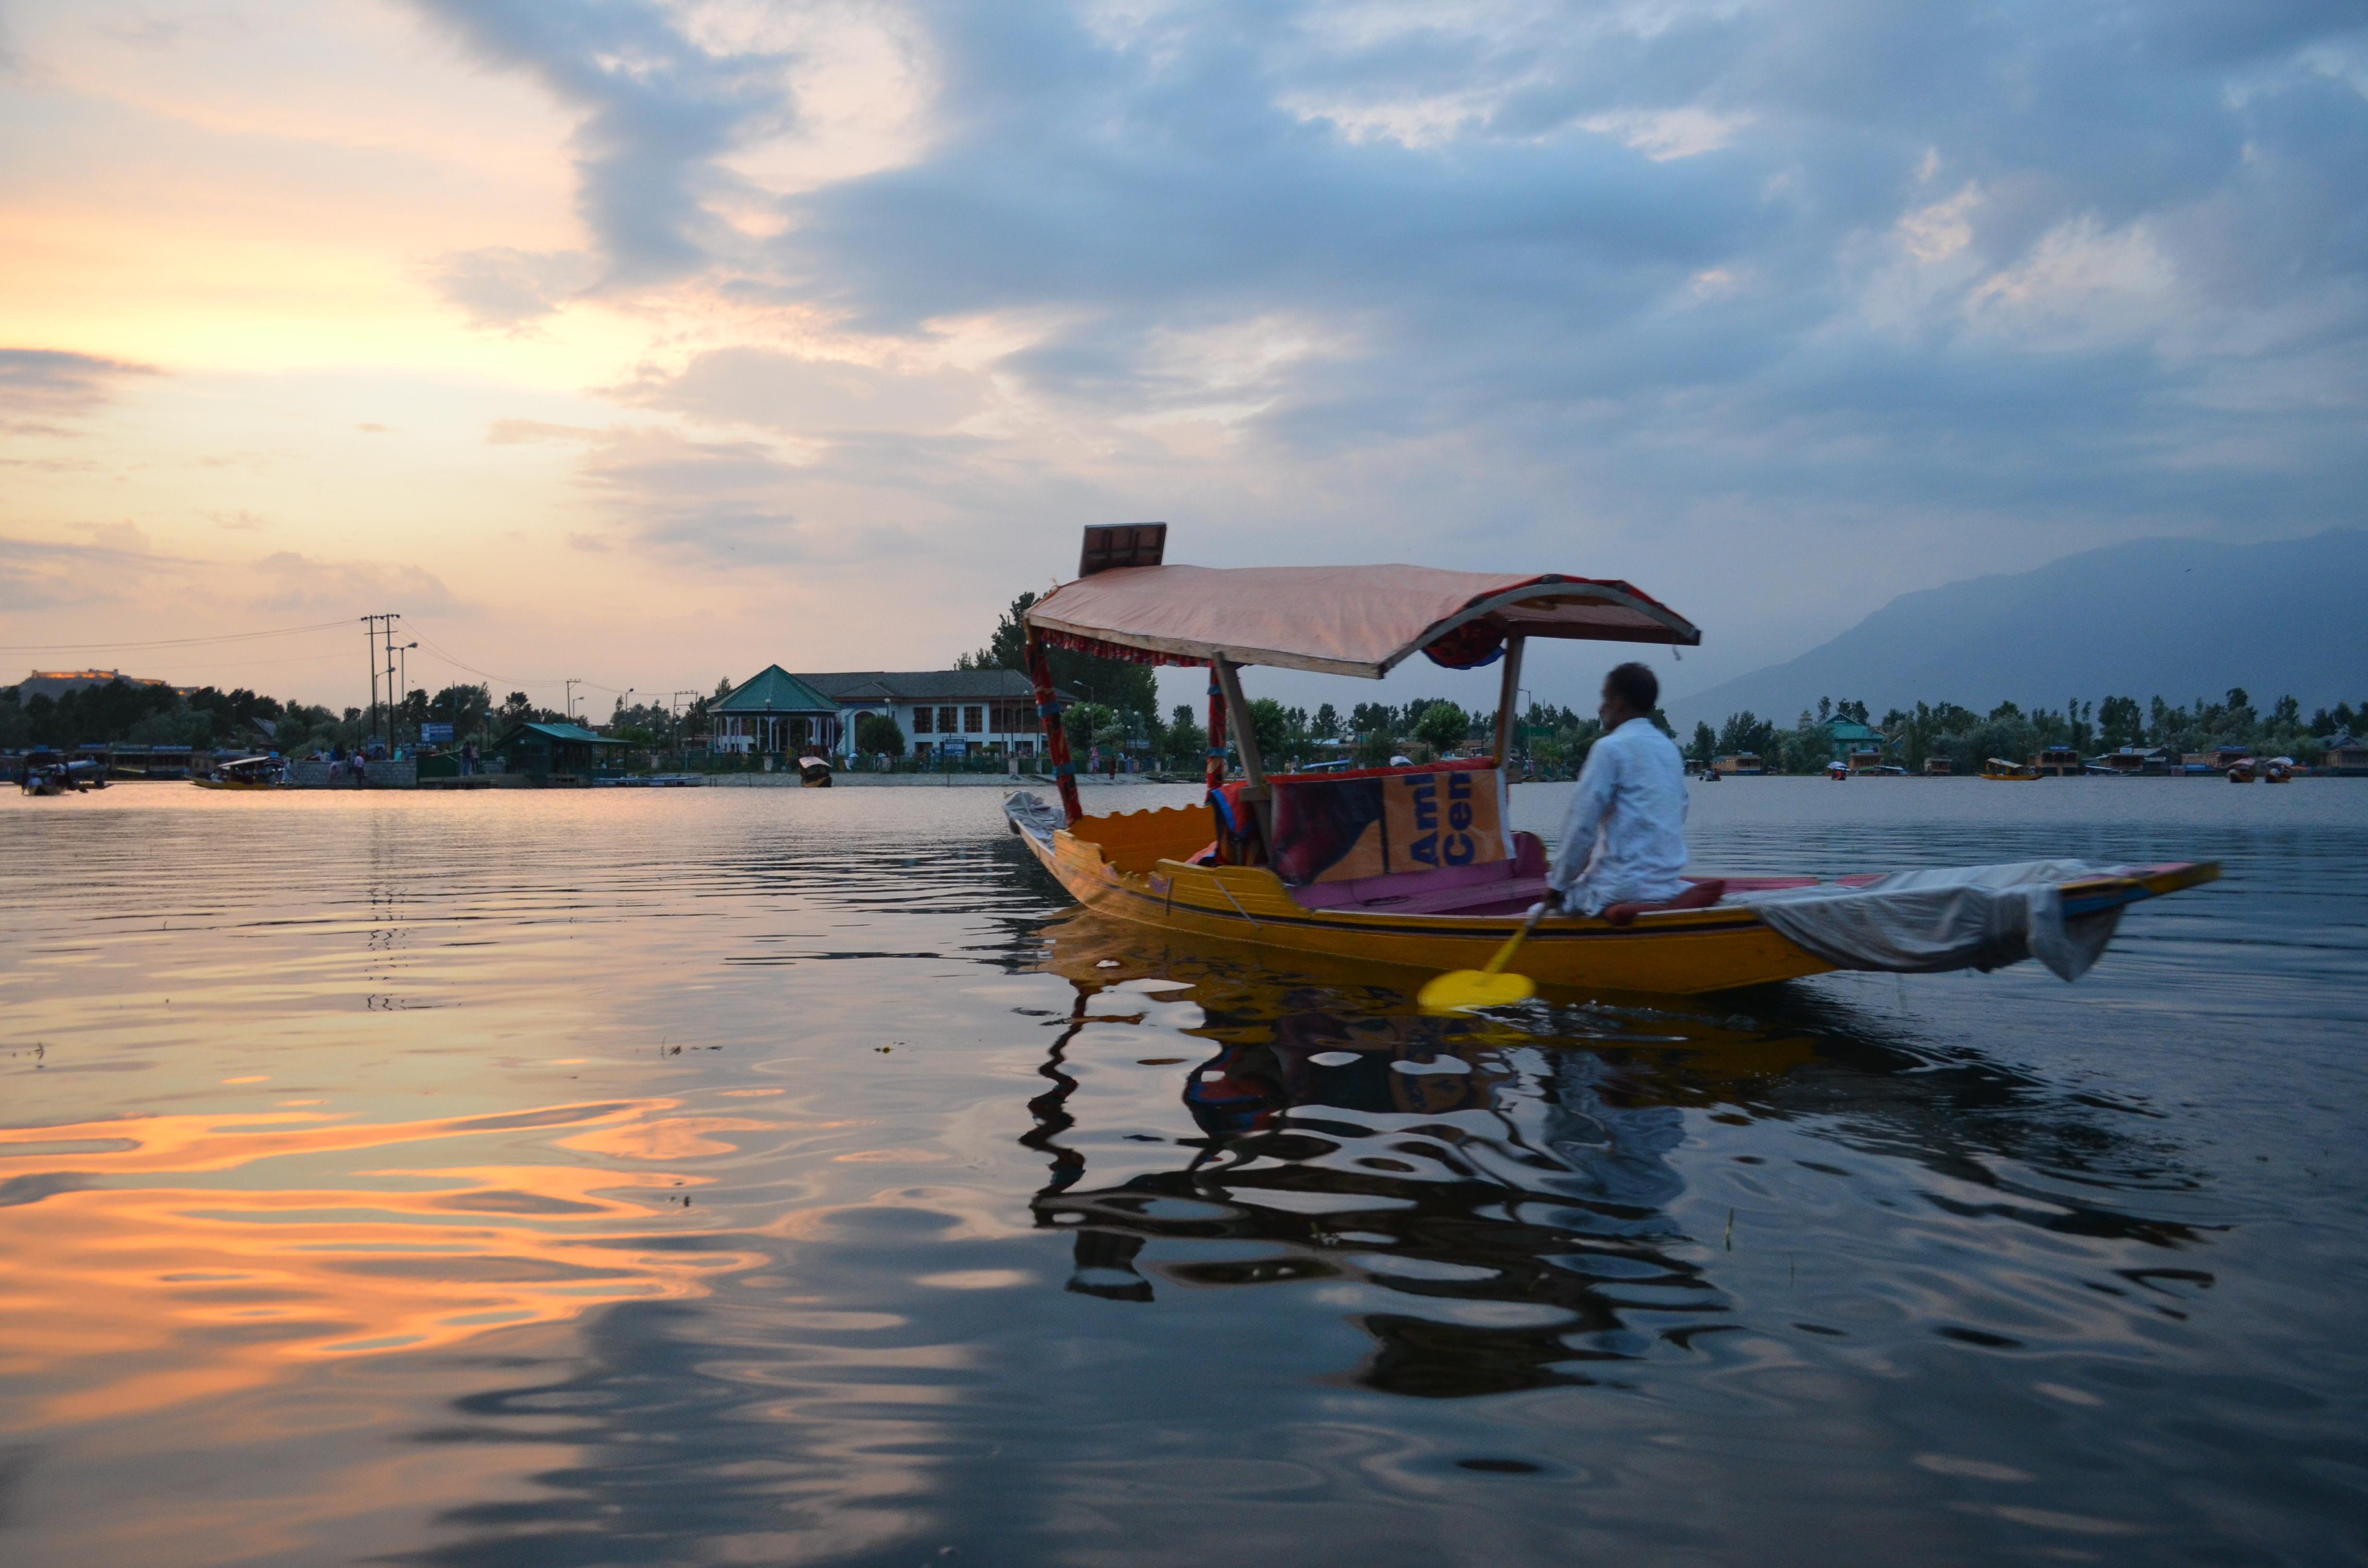 dal-lake-kashmir-meetu-chadha-rbg